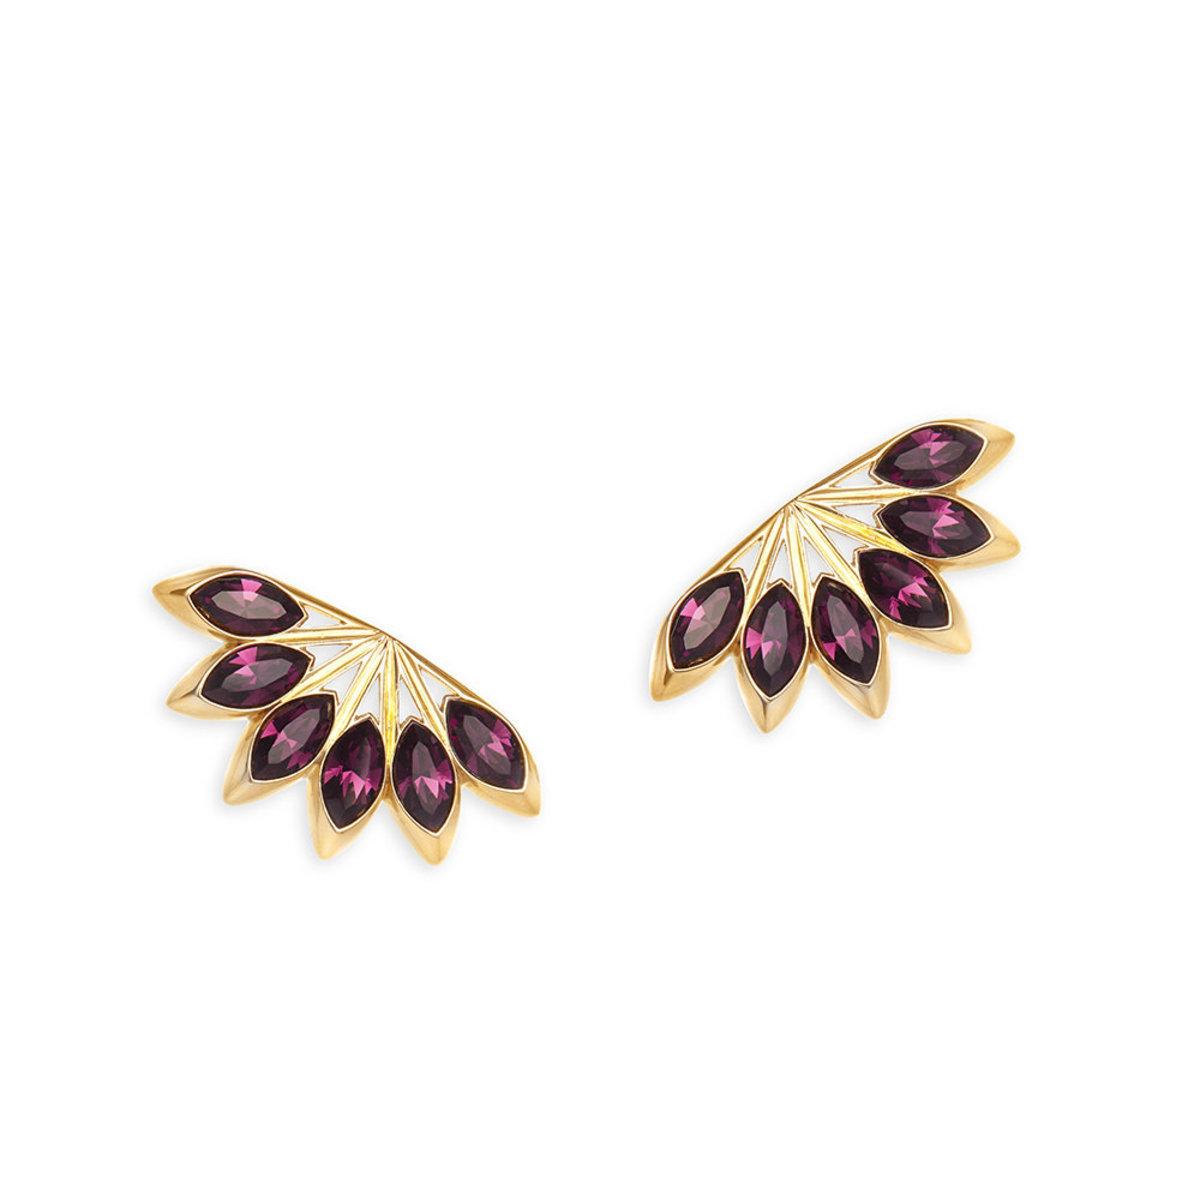 Ailes:gold plating, Swarovski amethyst crystal pierced earrings